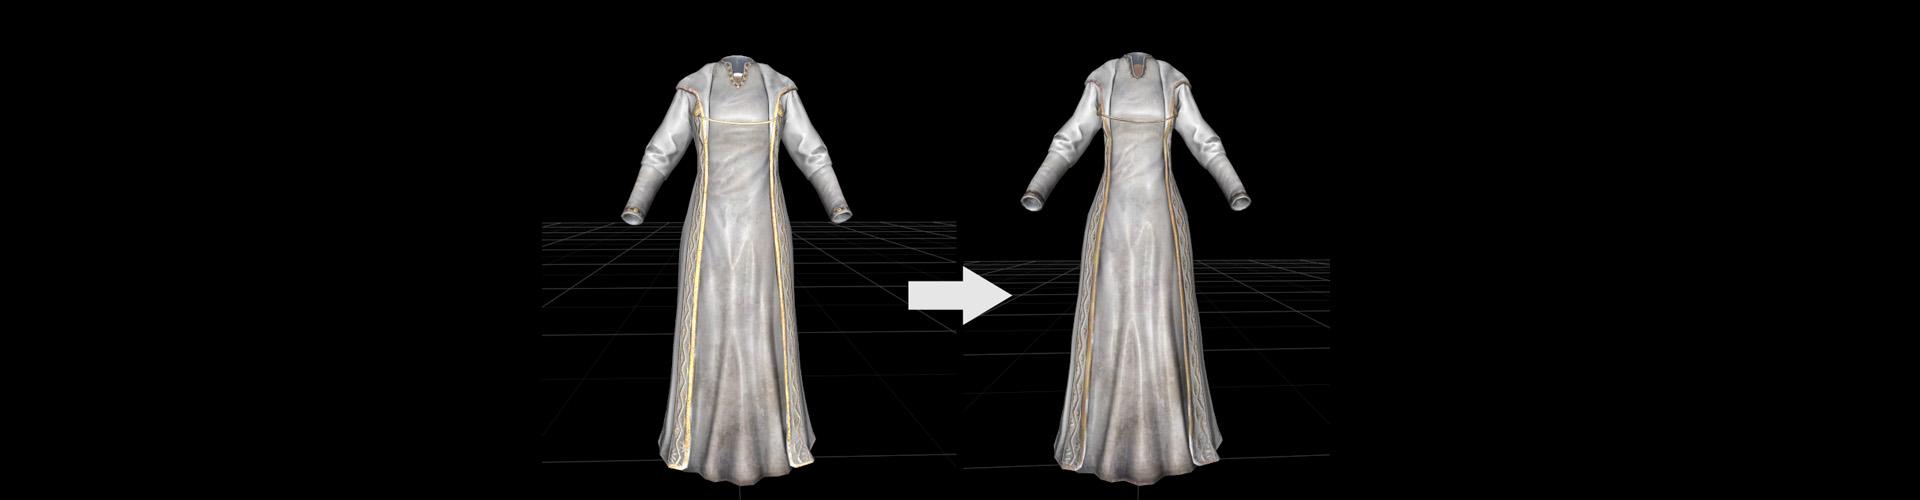 Skyrim Wedding Dress.Skyrim Wedding Dress Hdt Raveitsafe